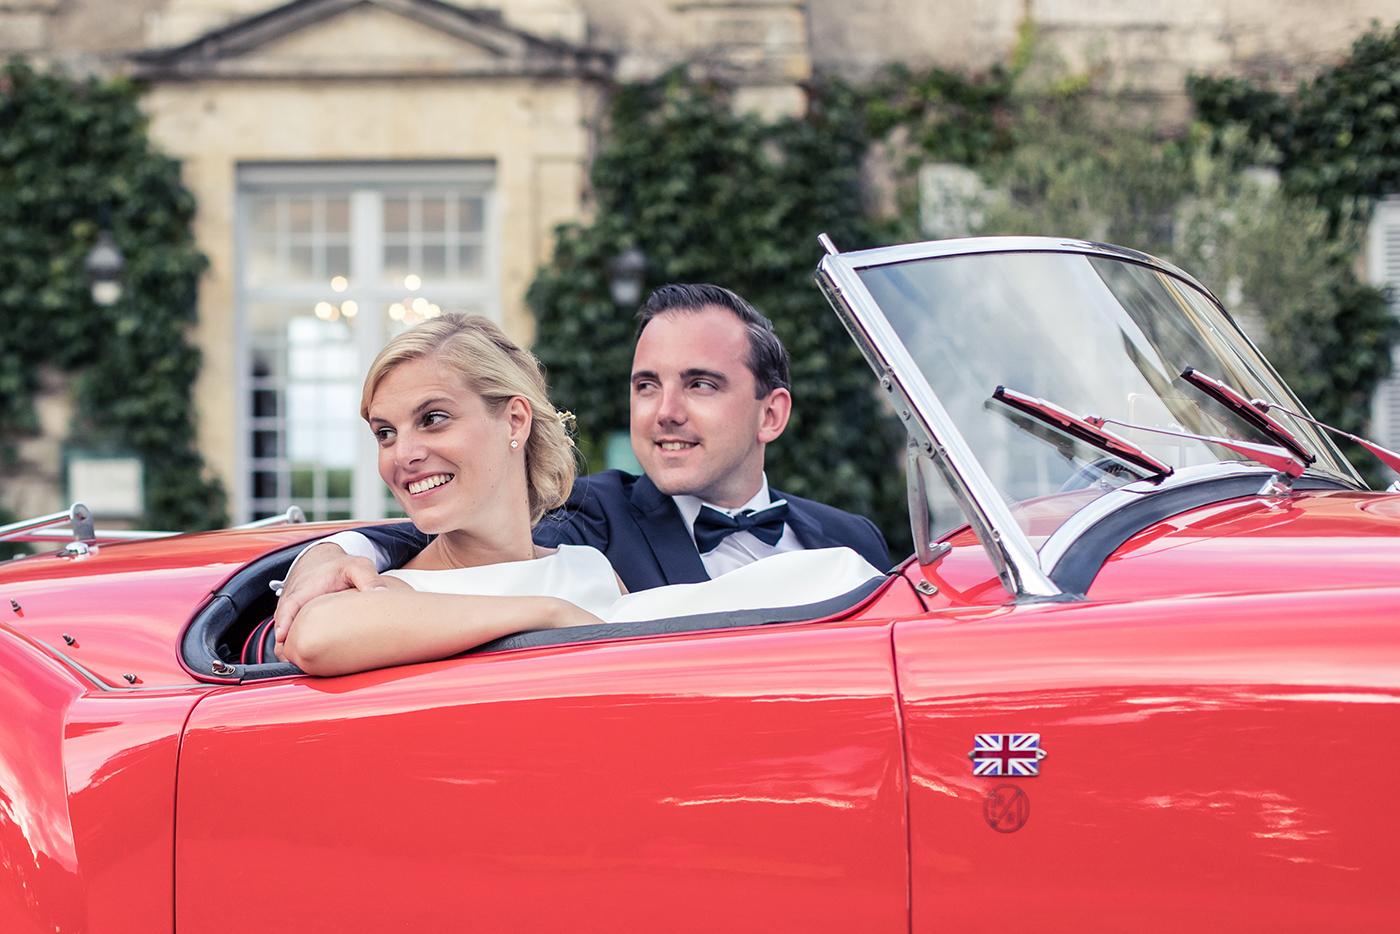 Photographe-mariage-couple-guillaume-heraud-09